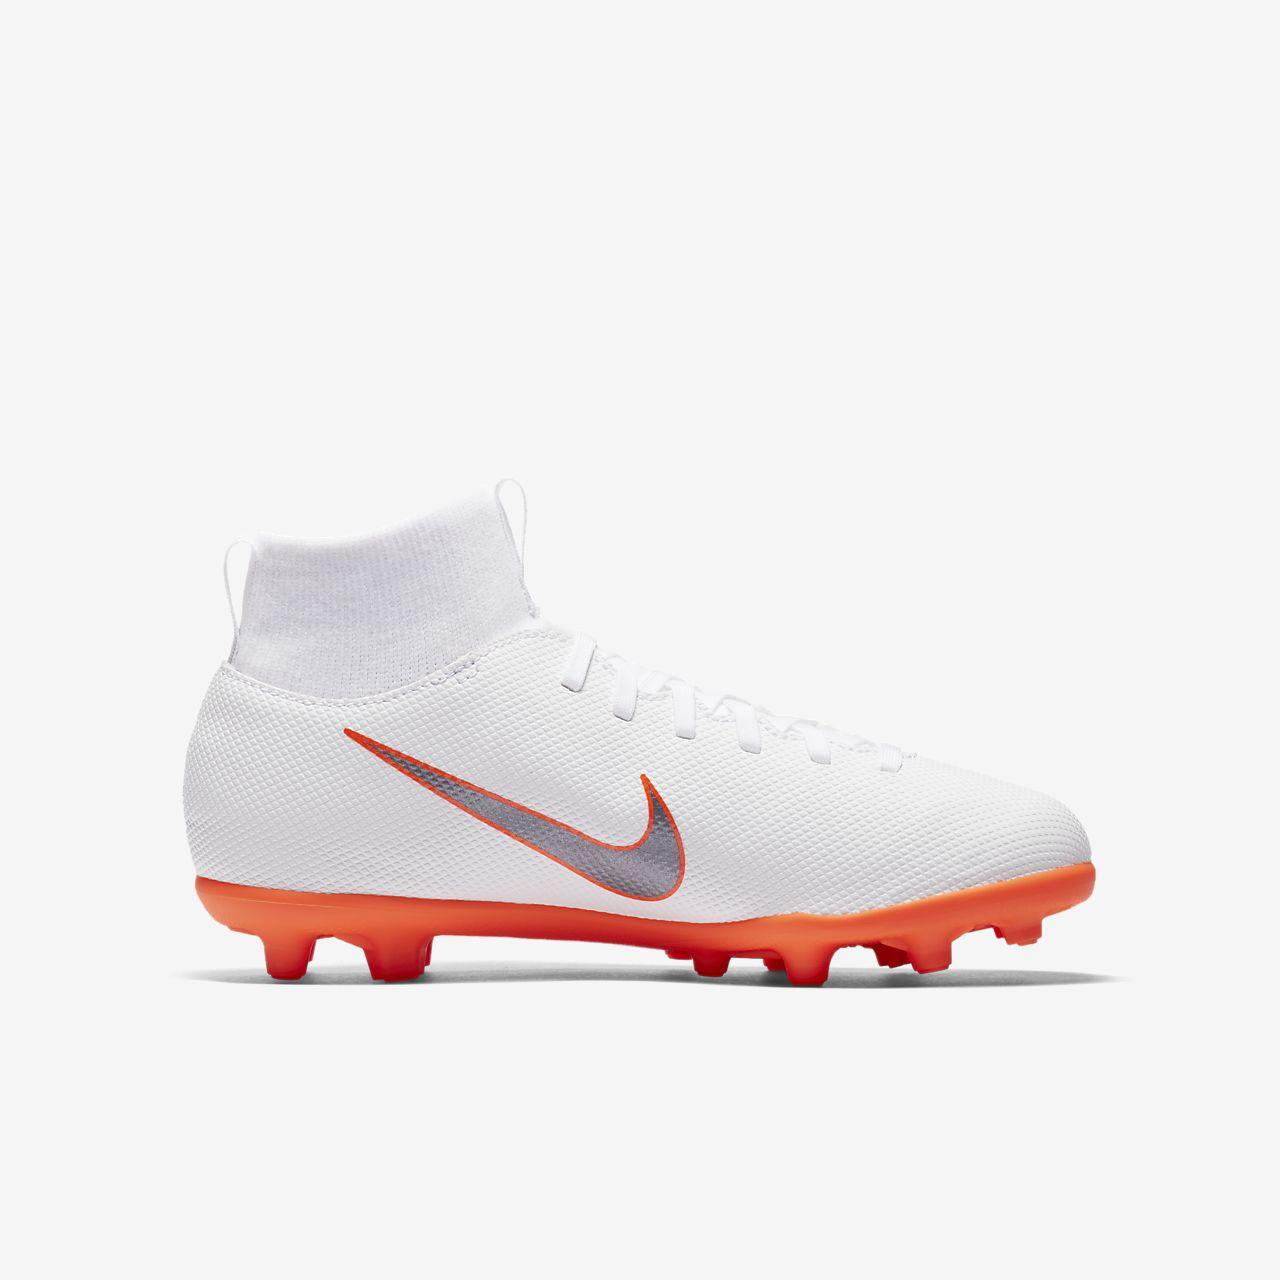 ... Chaussure de football multi-terrains à crampons Nike Jr. Mercurial  Superfly VI Club MG